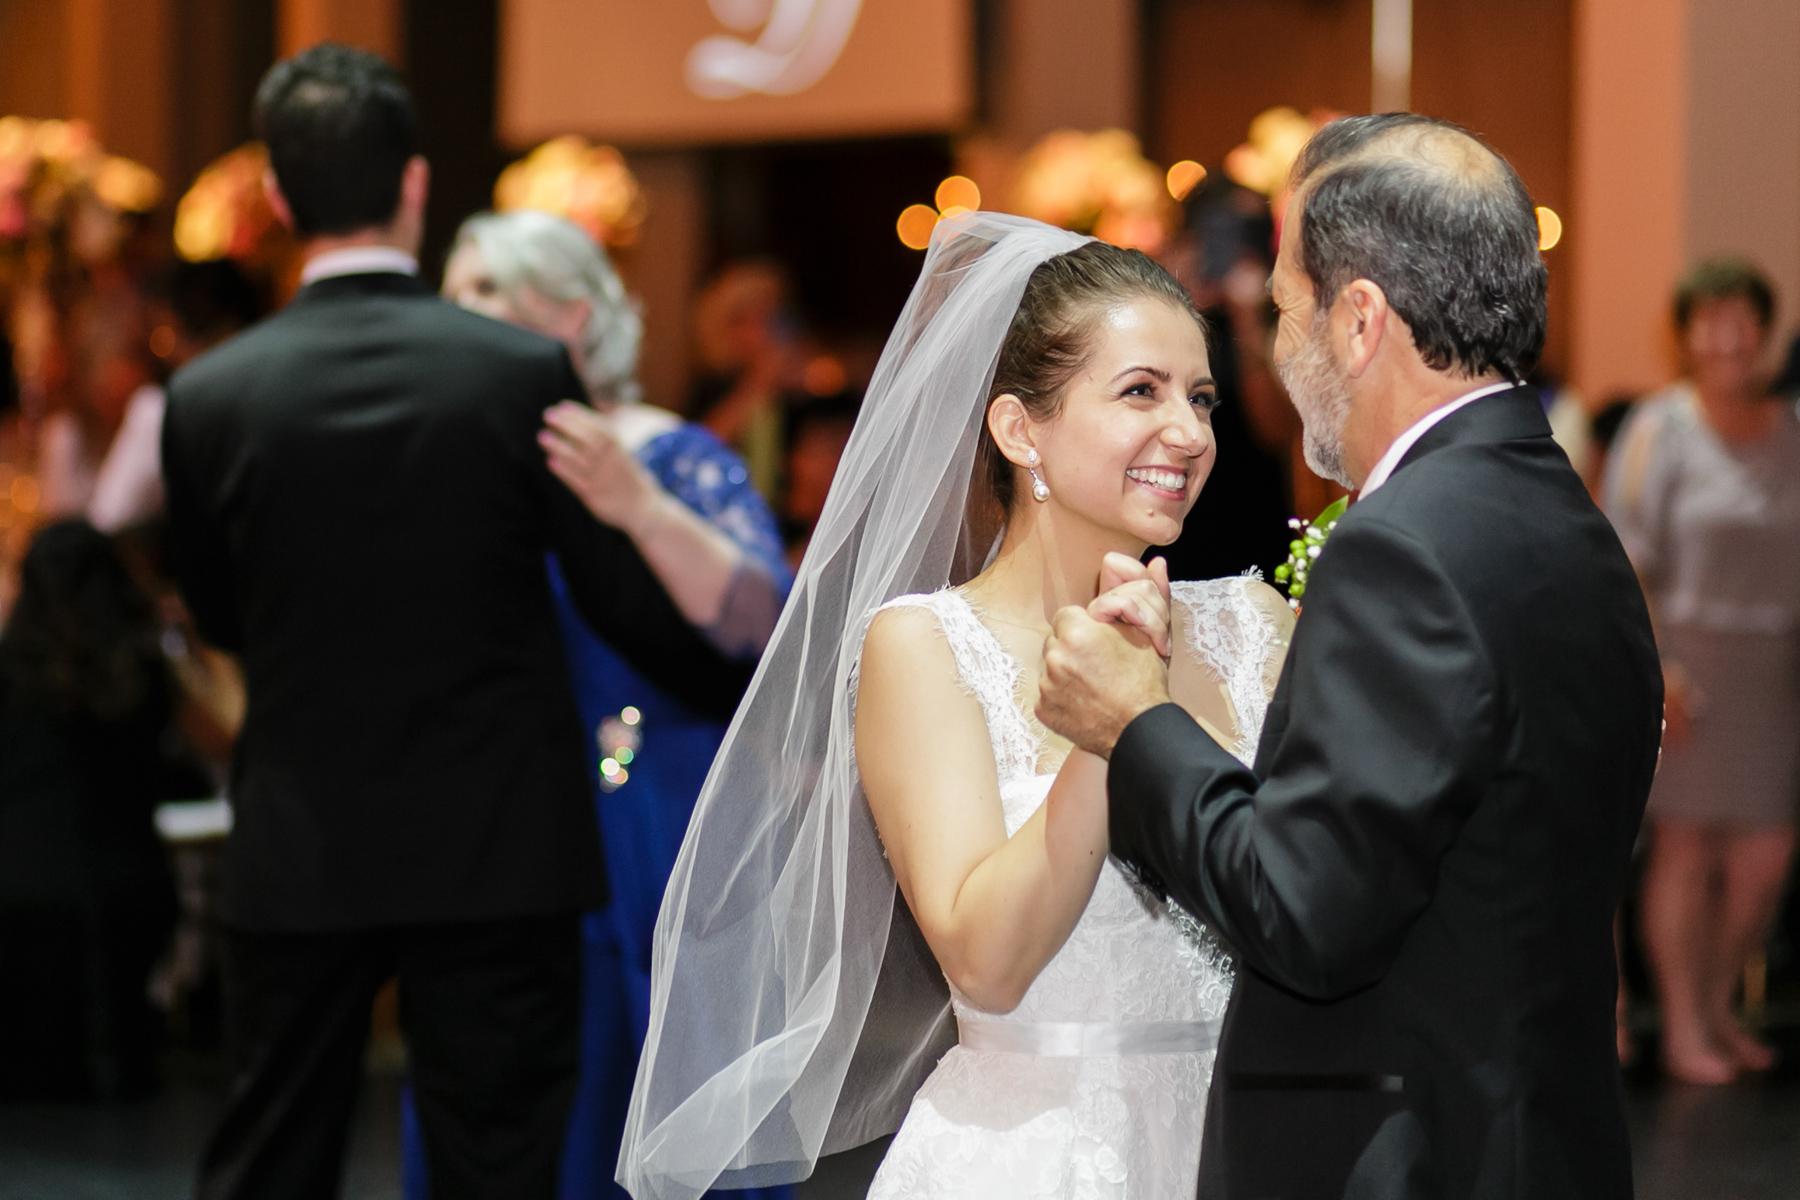 joeewong-chdi-toronto-liberty-grand-wedding-234